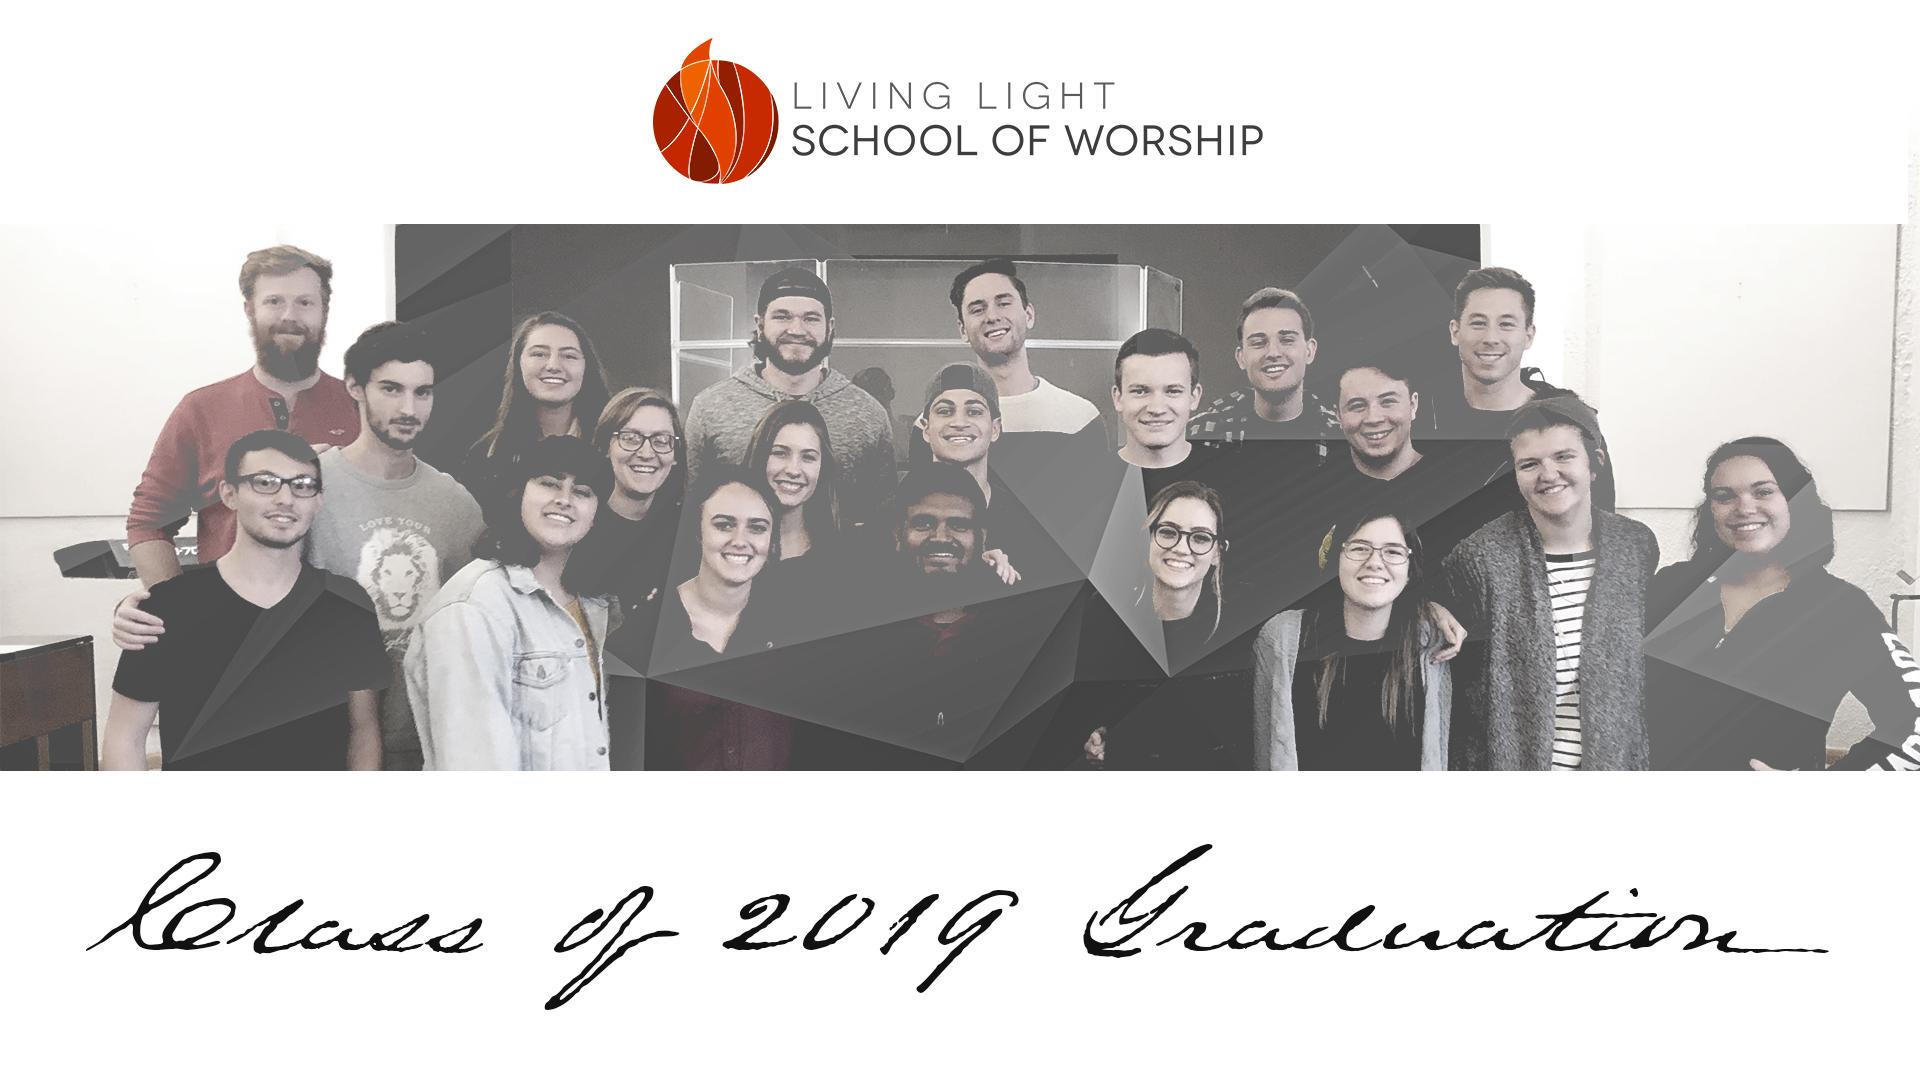 LLSOW Graduation 2019-1920x1080-app